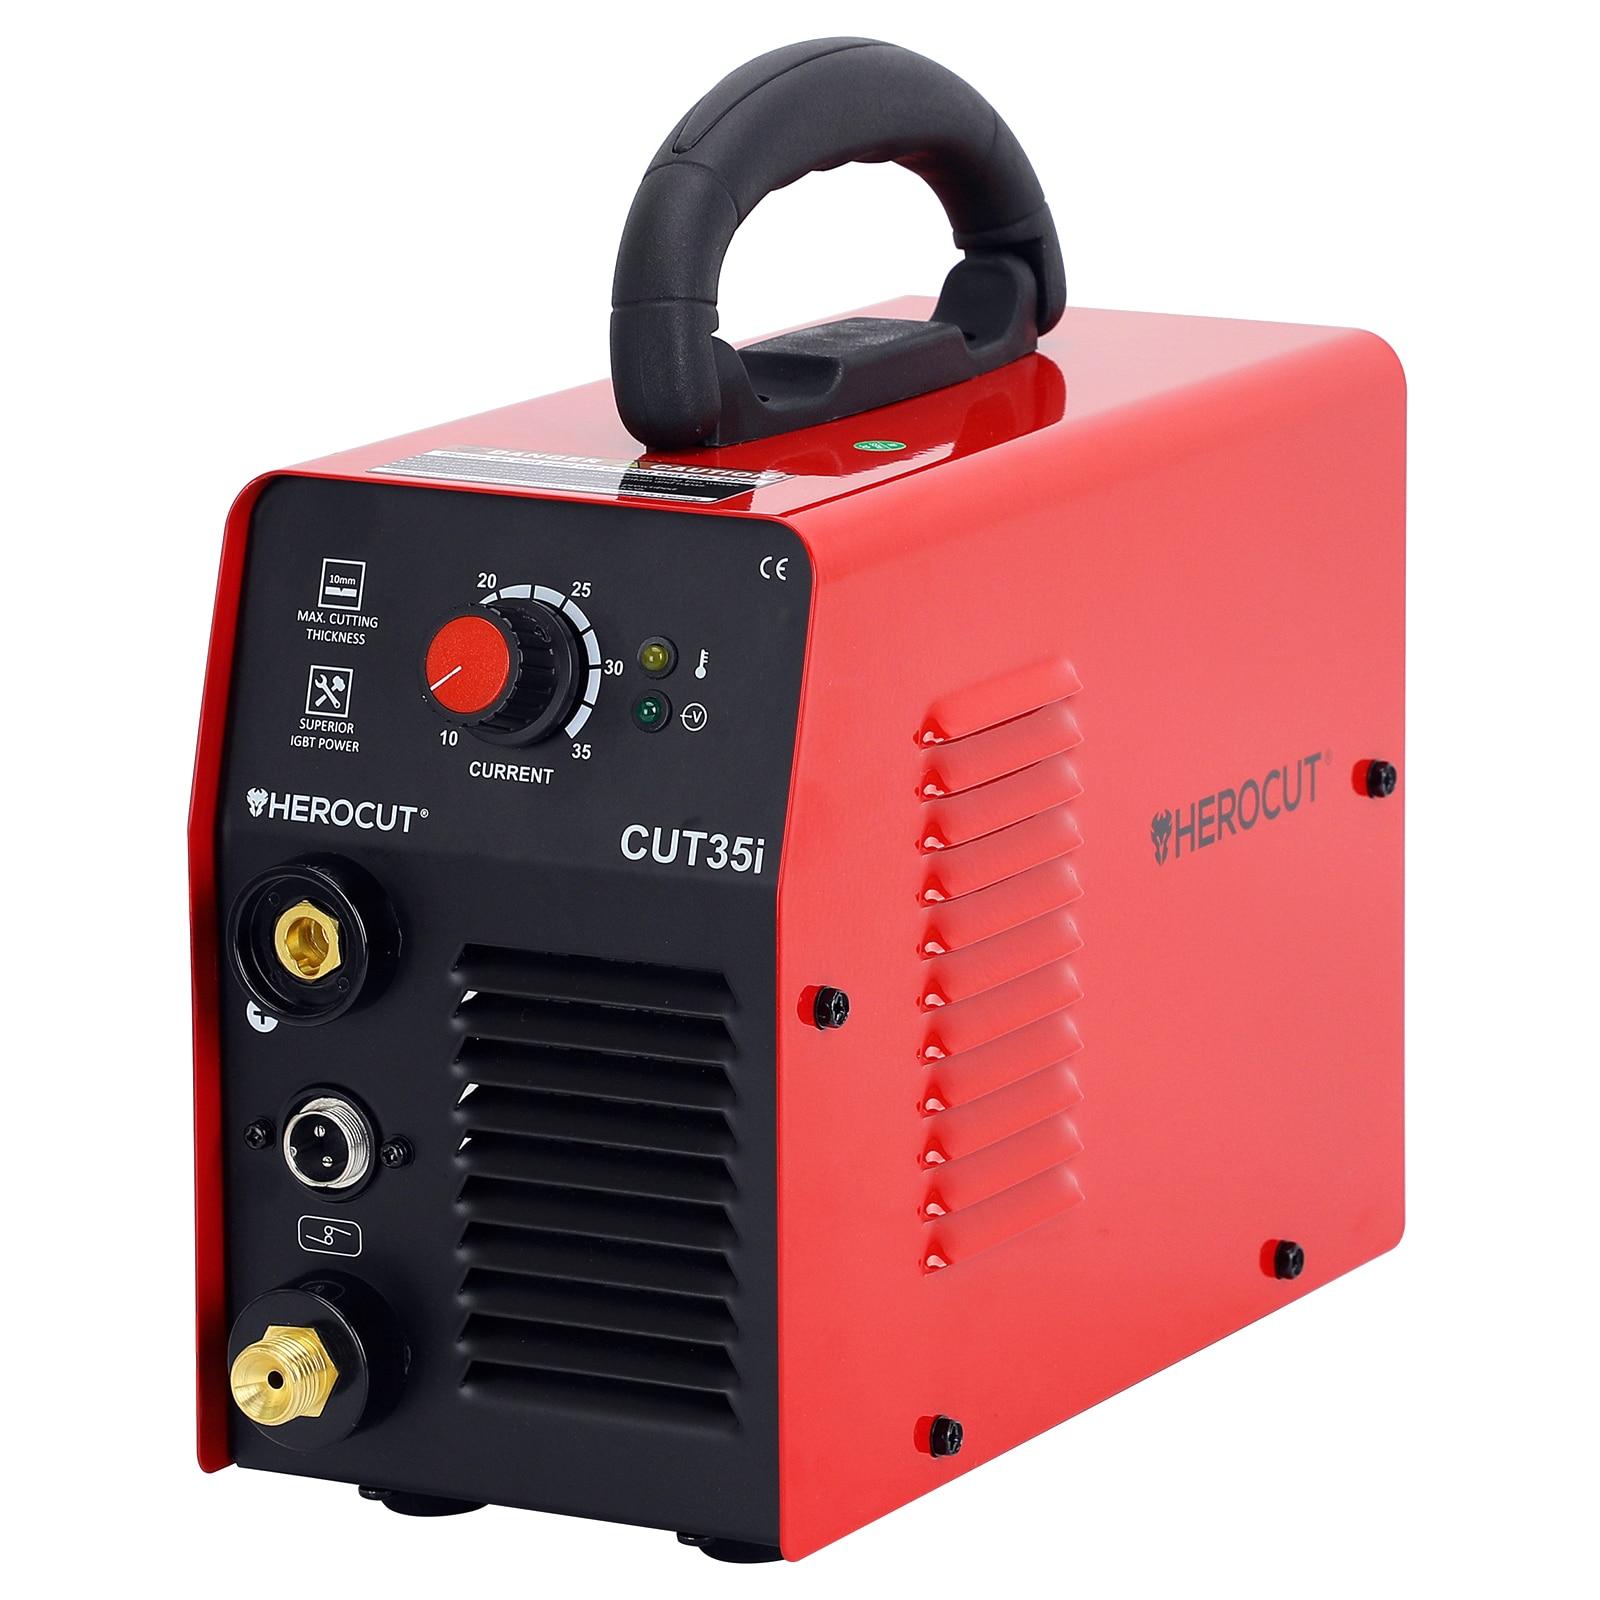 HeroCut Cut35i 220V Plasma Cutter Great To Cut Stainless Steel 6mm Clean Cut Air Plasma Cutting Machine